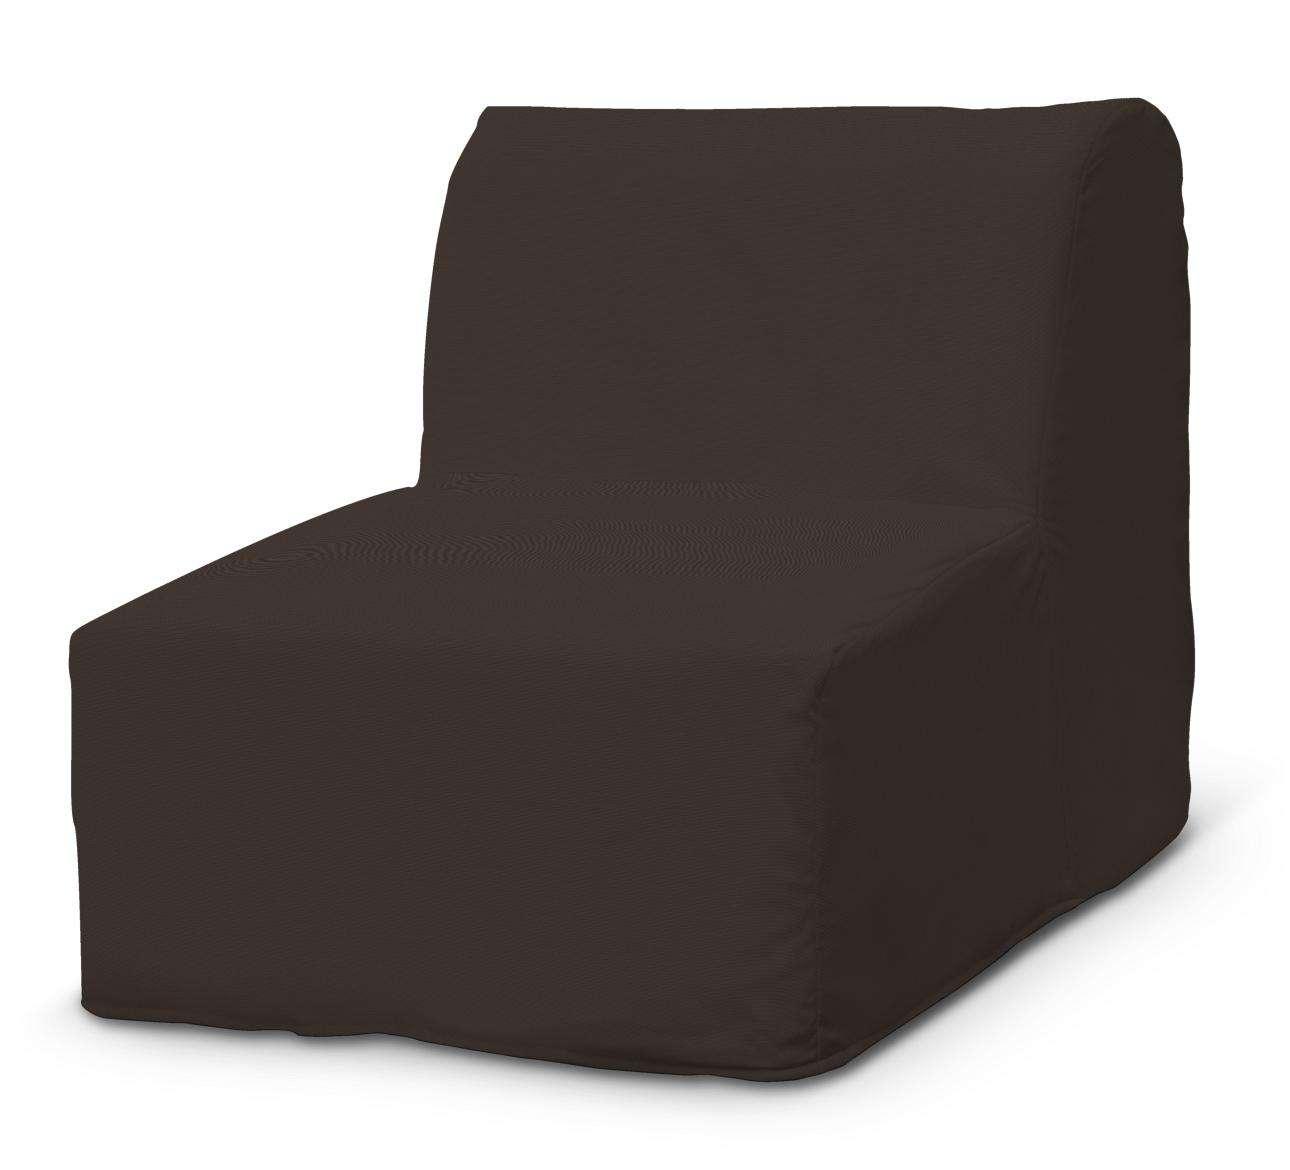 Pokrowiec na fotel Lycksele prosty fotel Lycksele w kolekcji Cotton Panama, tkanina: 702-03